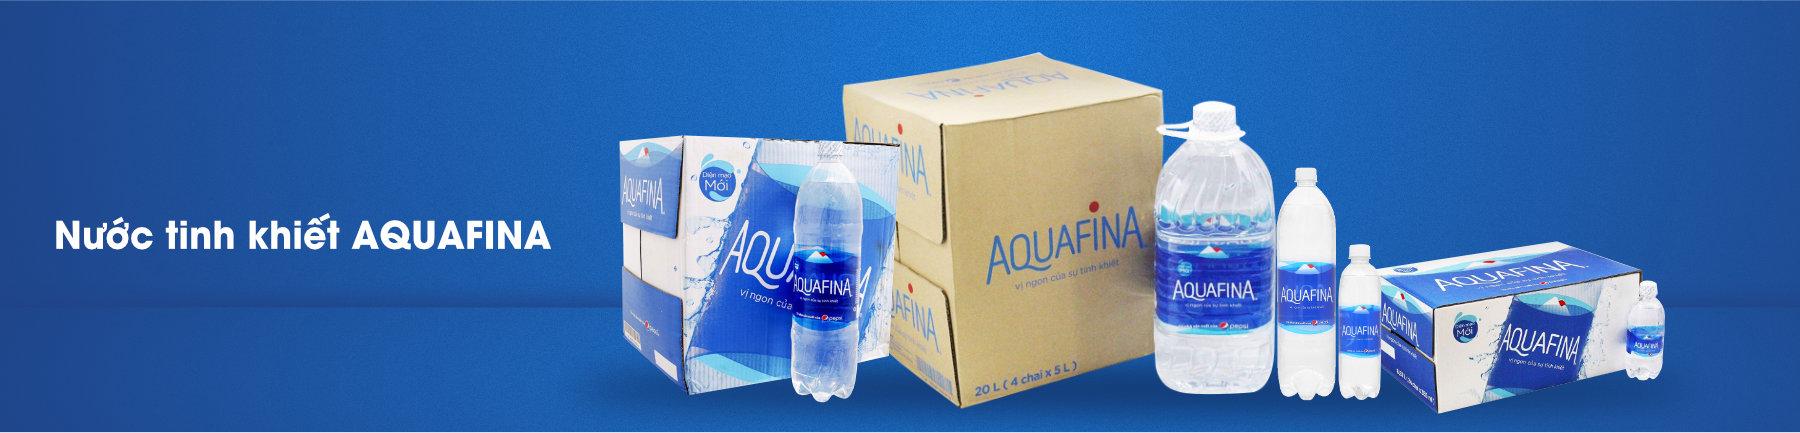 Sản phẩm Aquafina